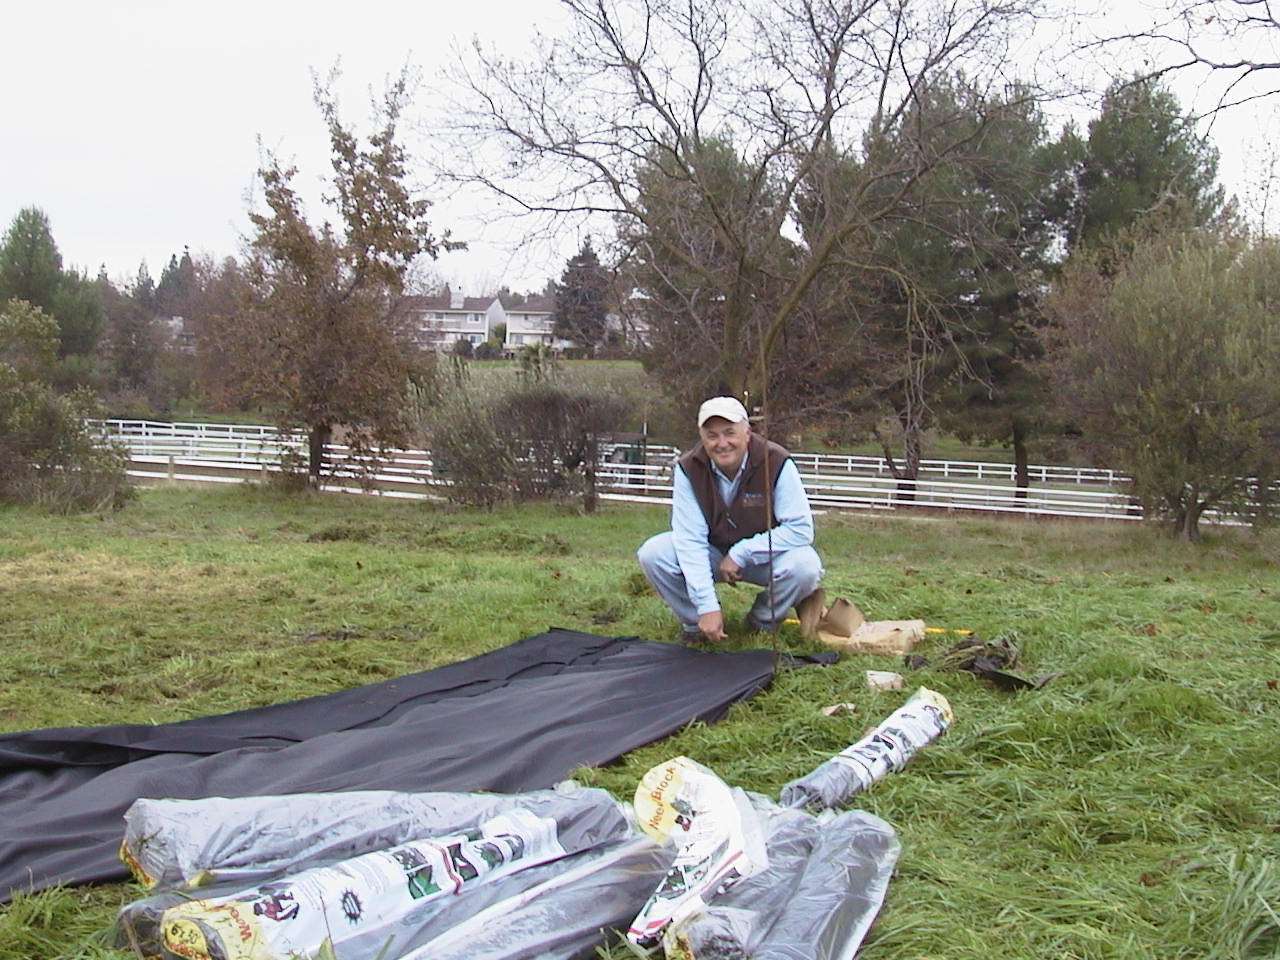 habitat restoration at Heather Farm Park